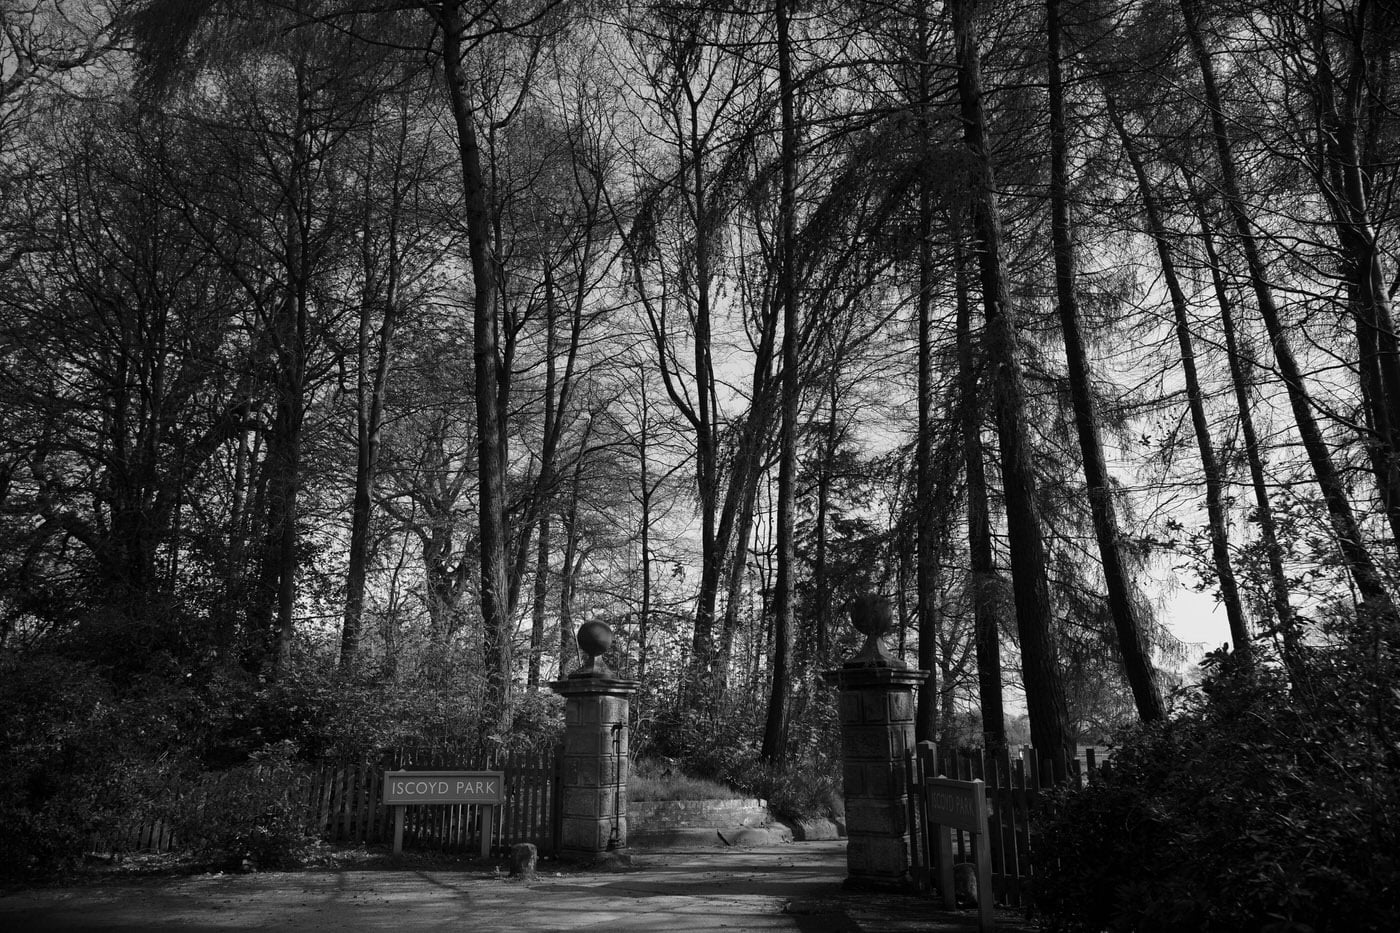 SHROPSHIRE-WEDDING-PHOTOGRAPHER-ISCOYD-PARK